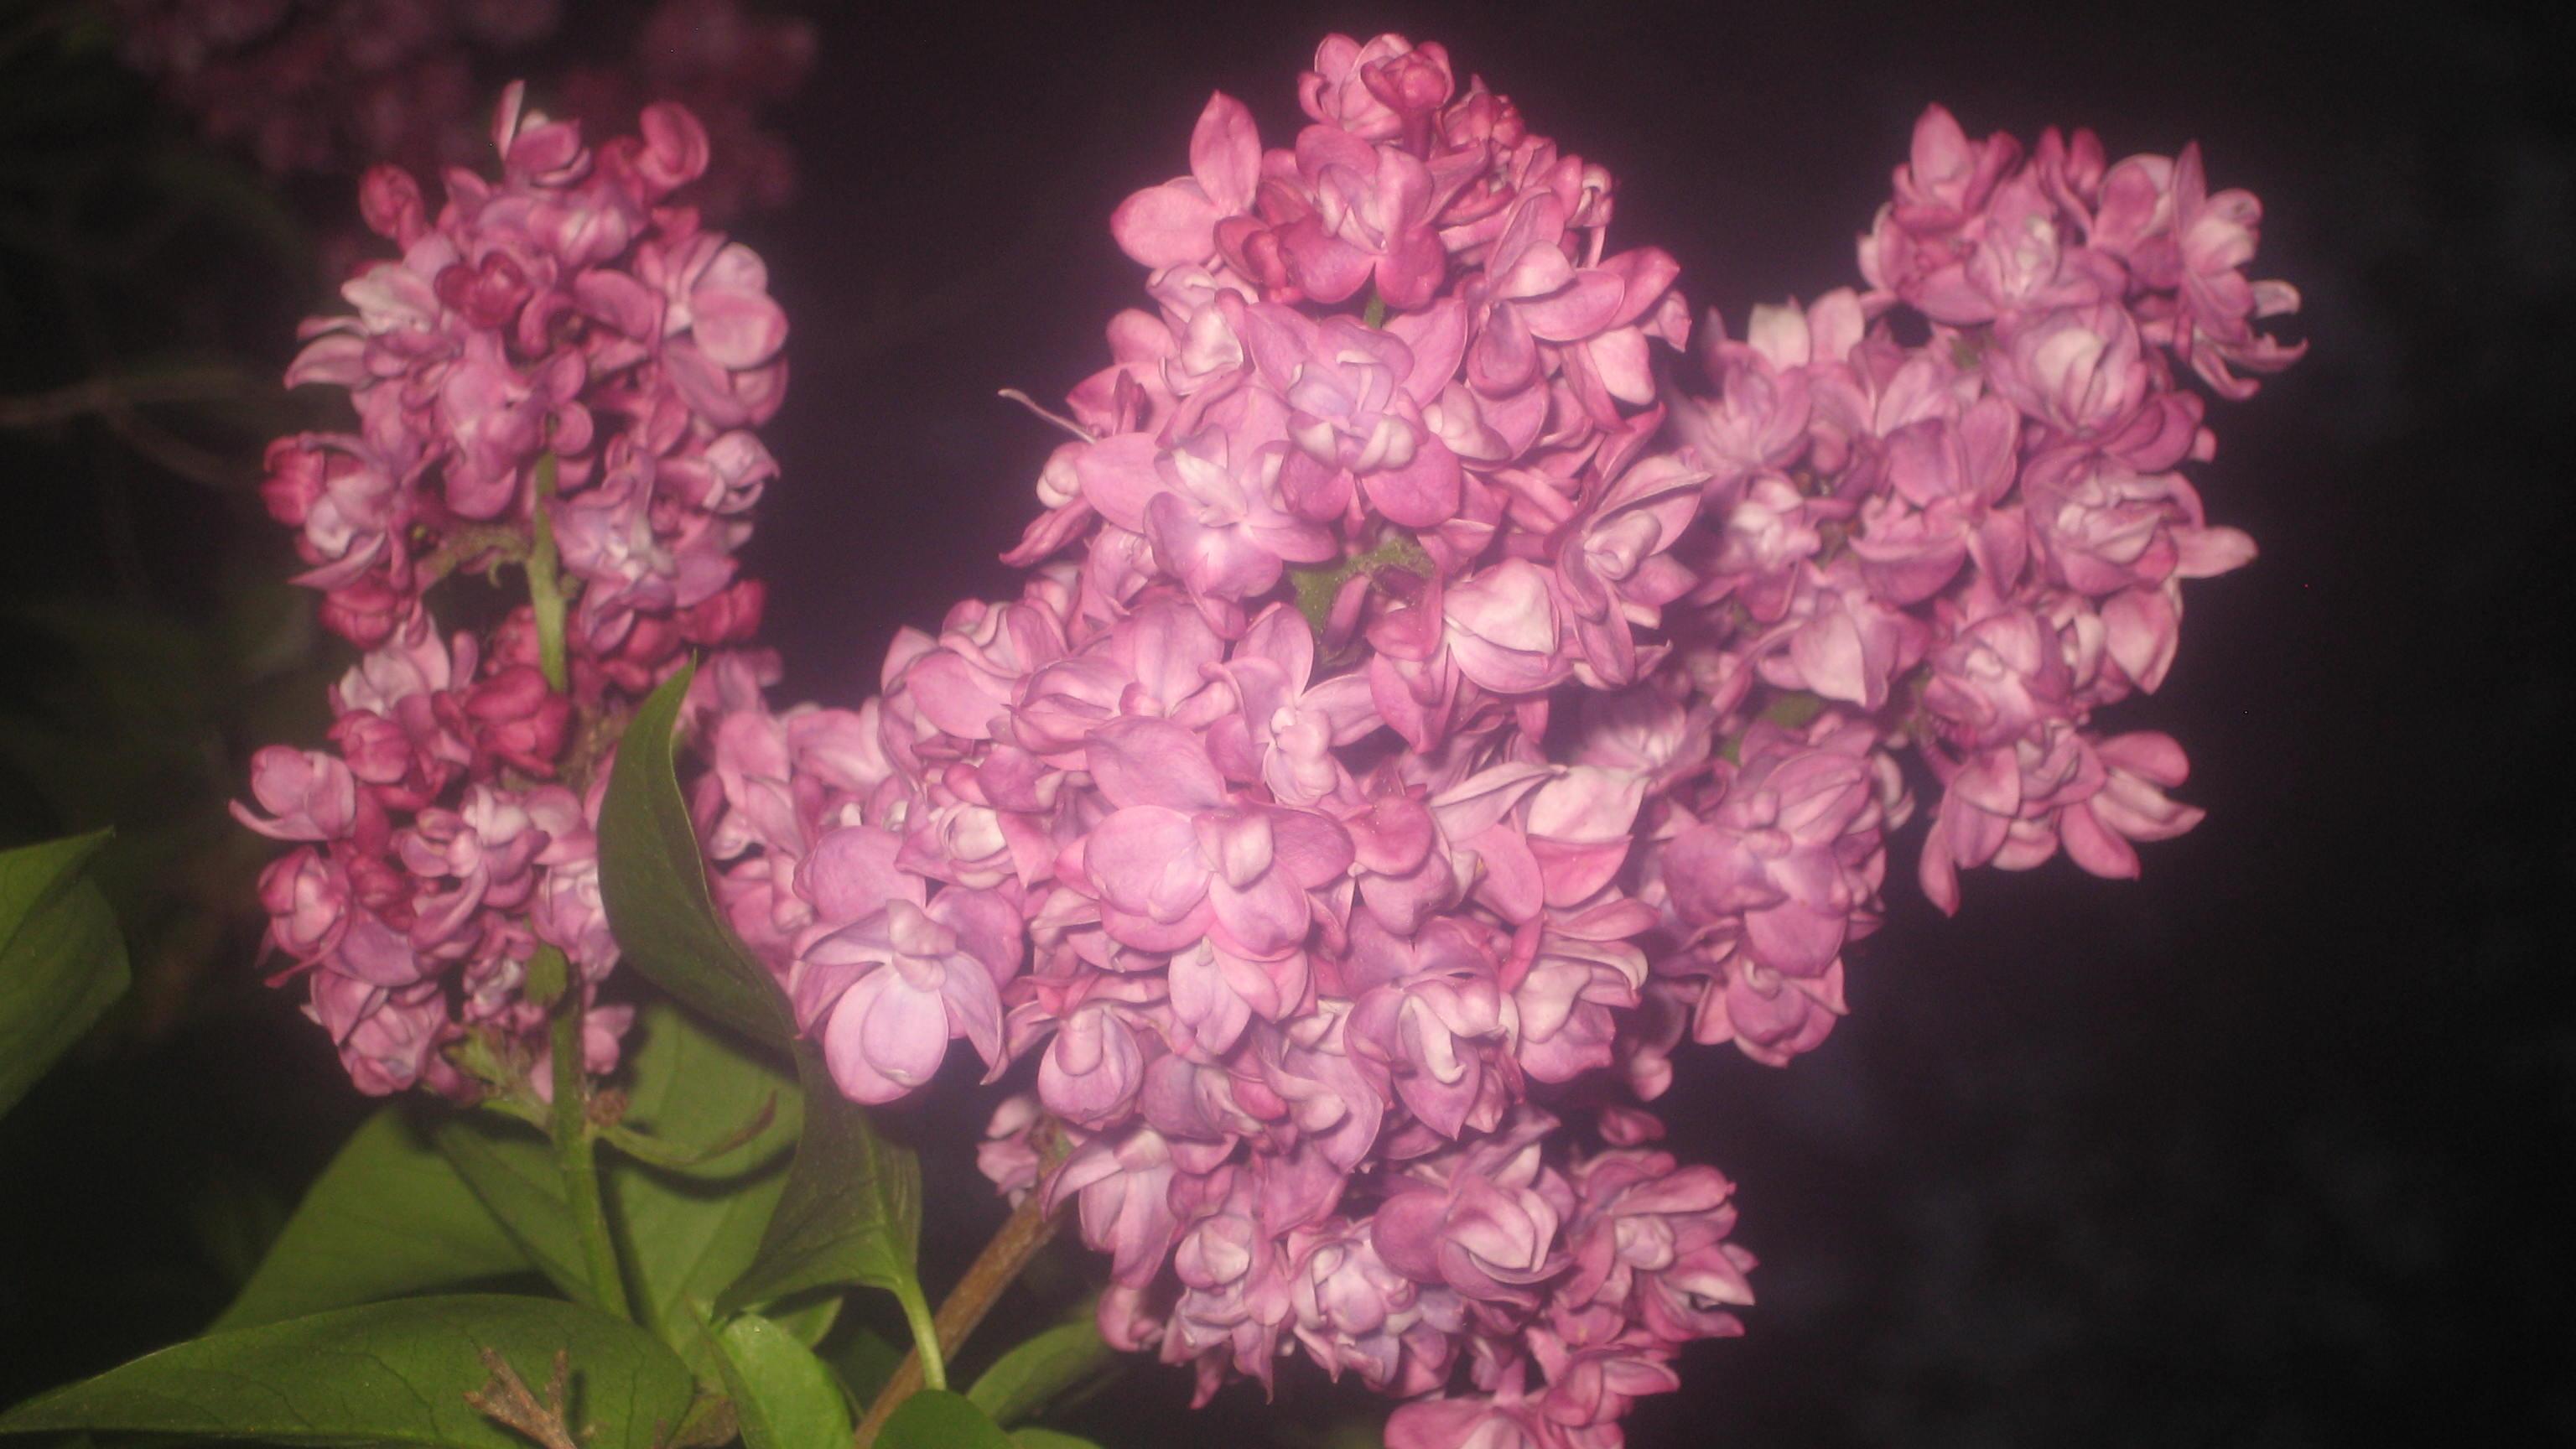 lilacsinbloom